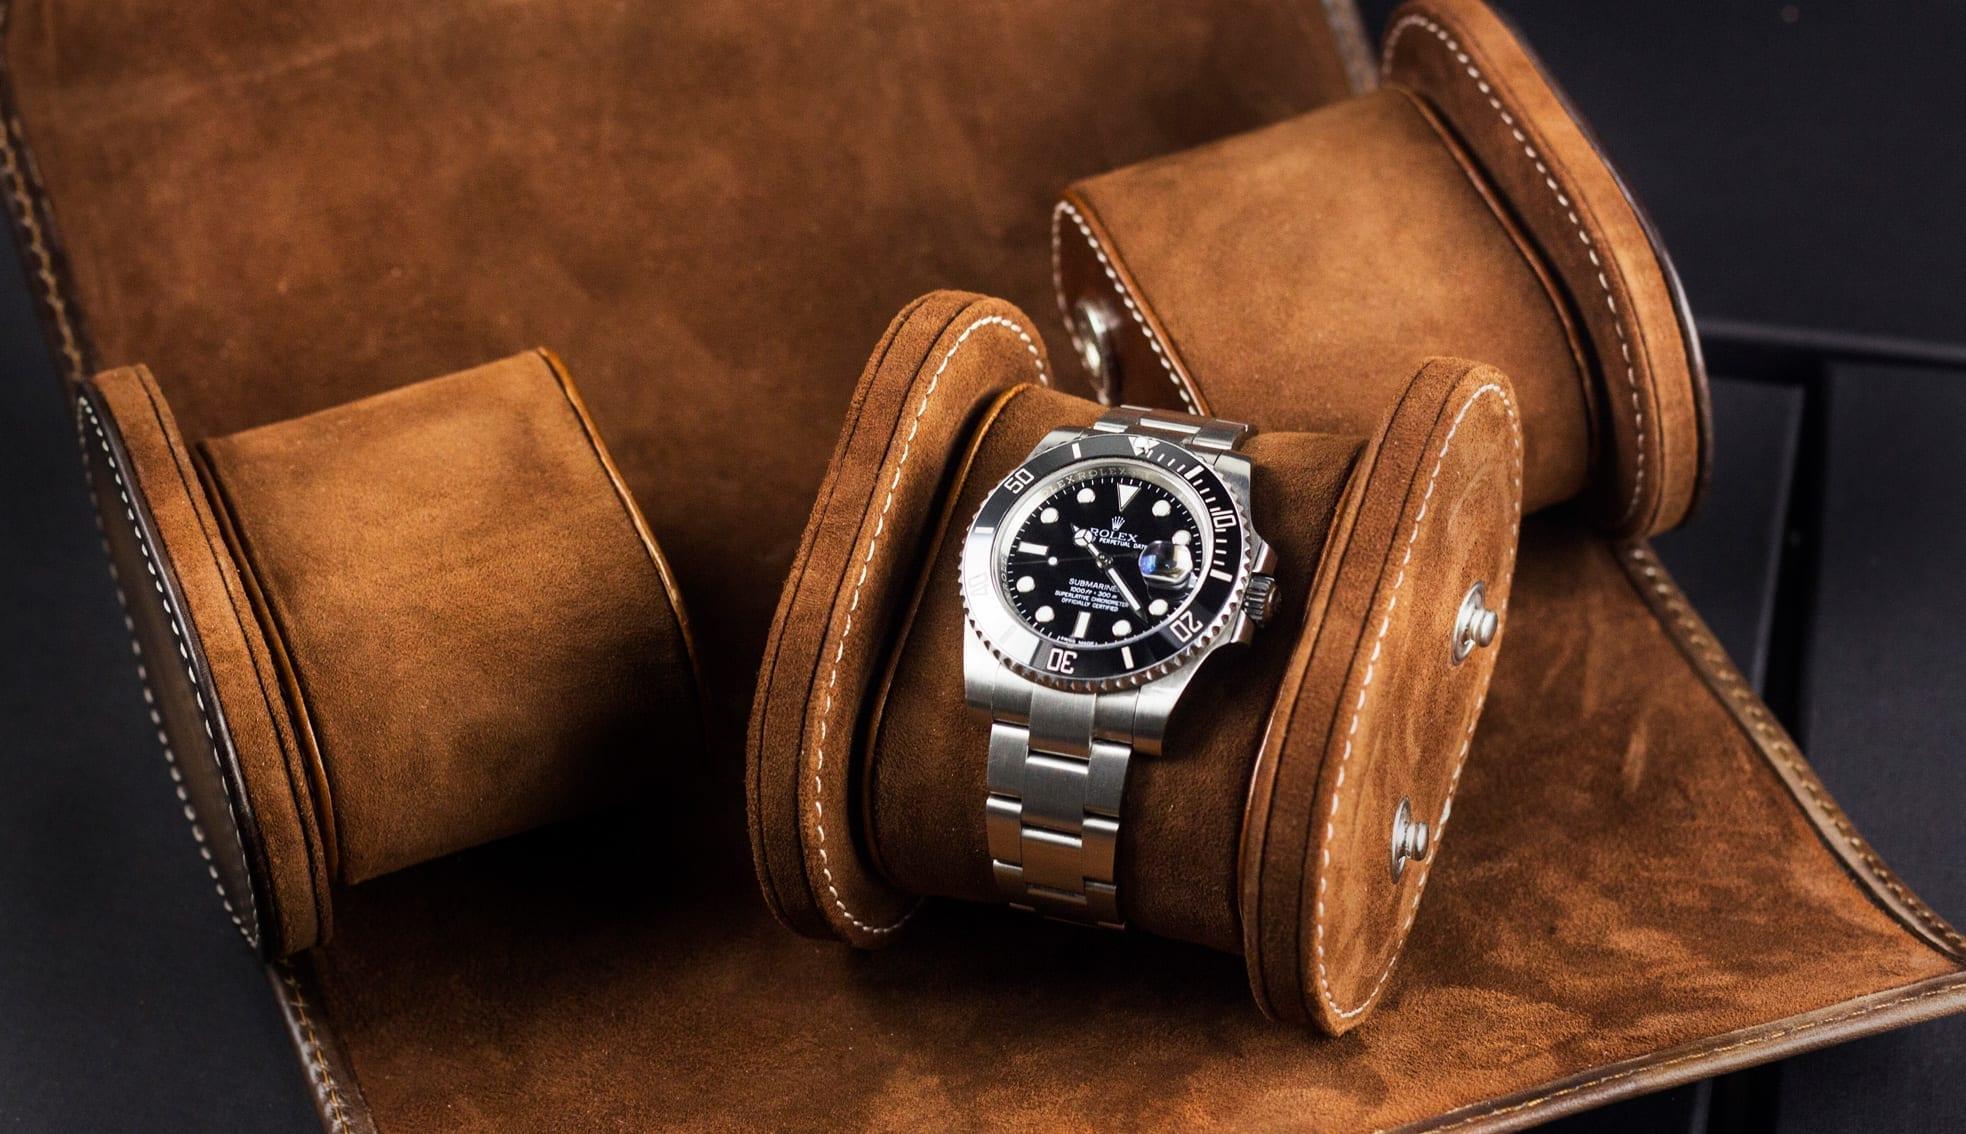 Uhrenrolle 3 Uhren Galata Montana hellbraun mit Uhr